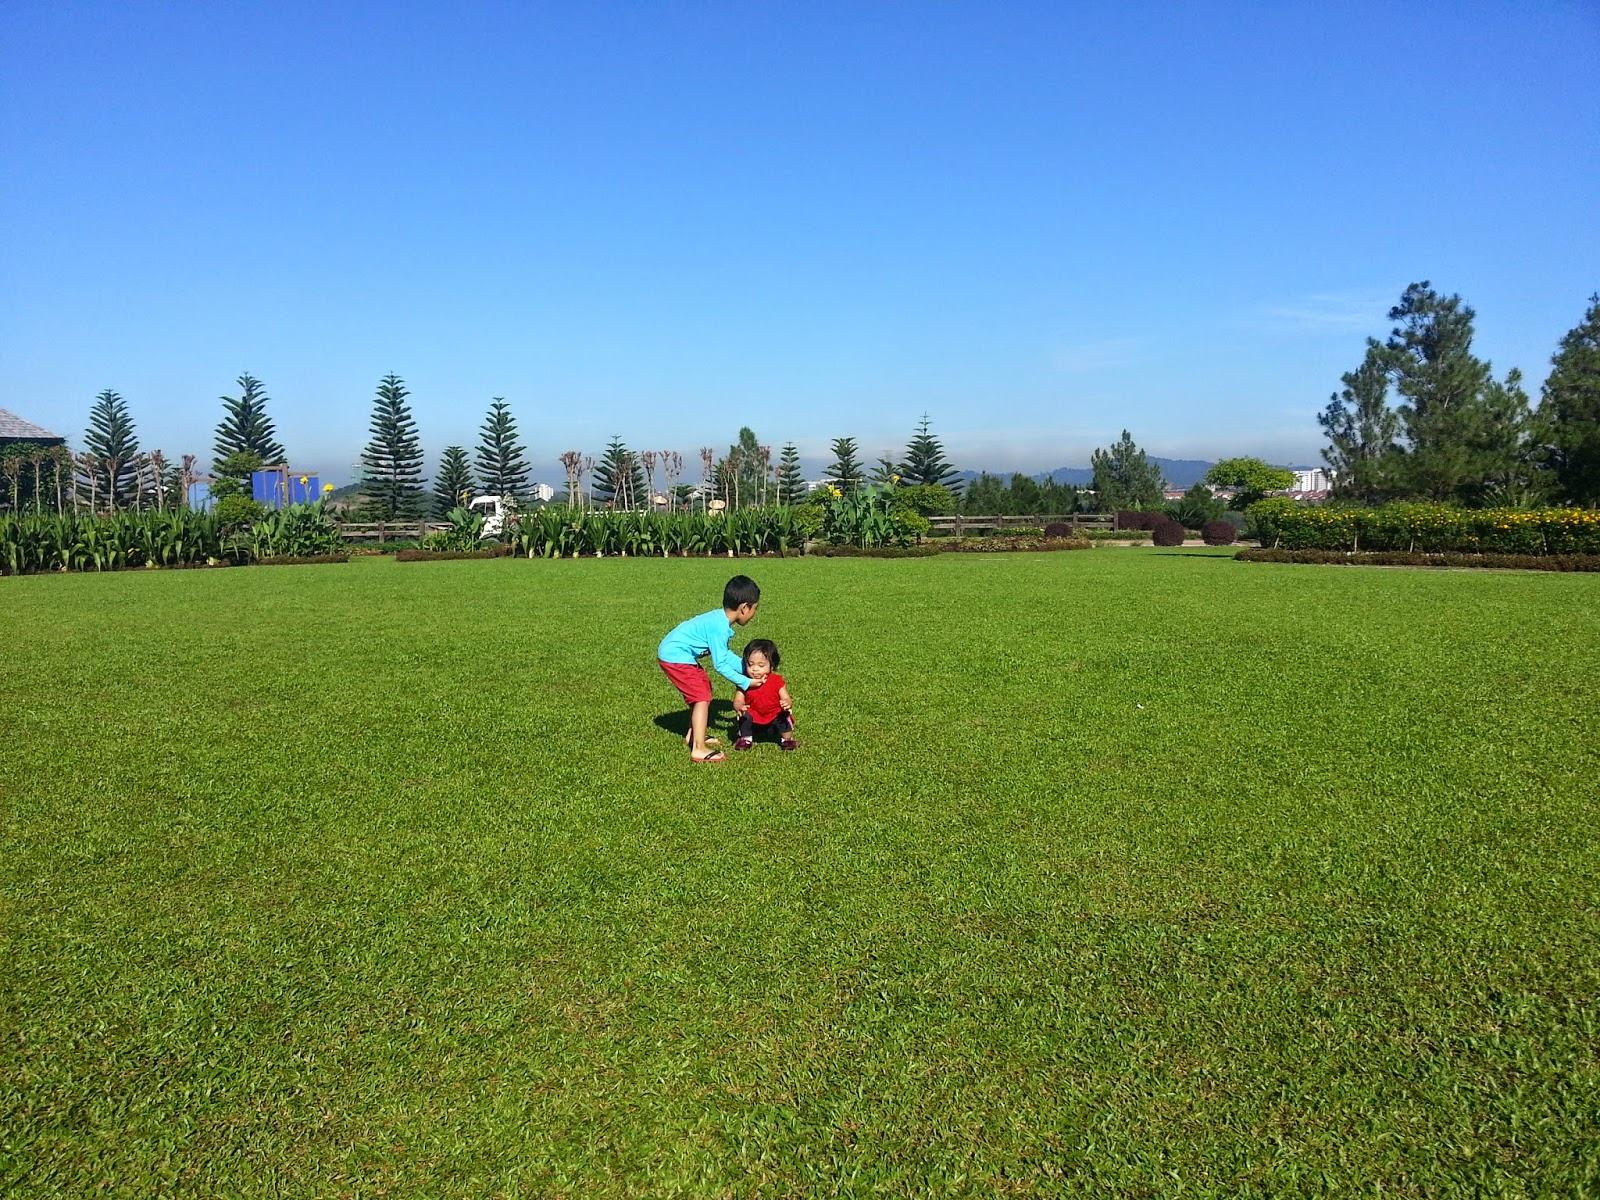 masyimalo heart riadah di taman saujana hijau yg indah